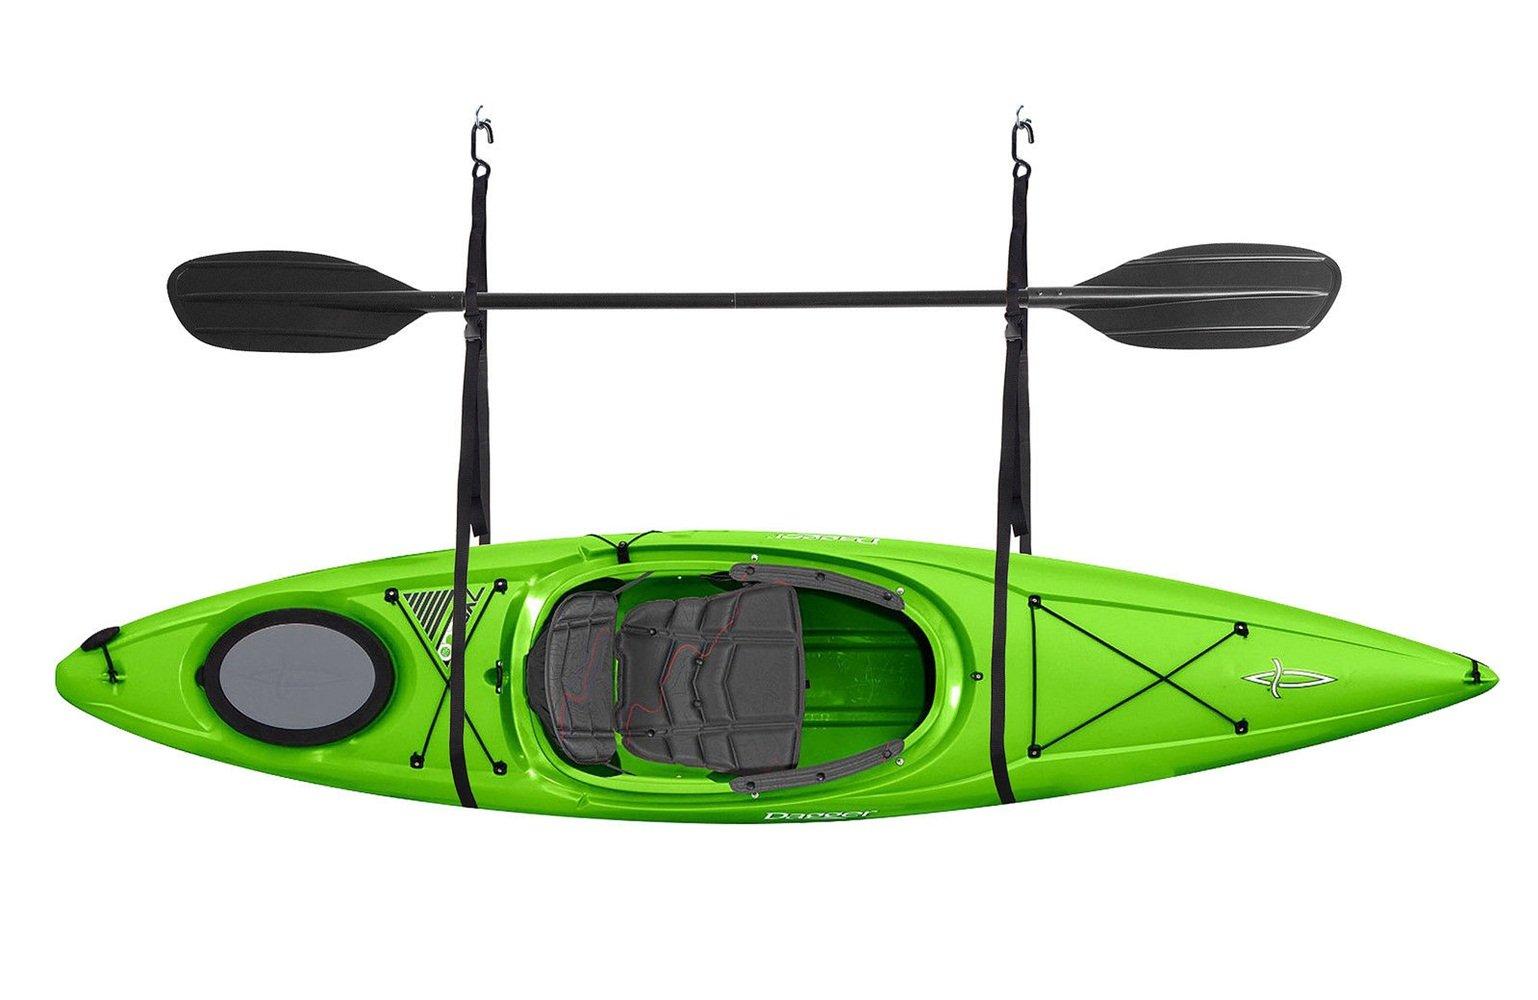 Kayak Hoist Strap Single Storage Garage Canoe Hoists 55 Lb Capacity